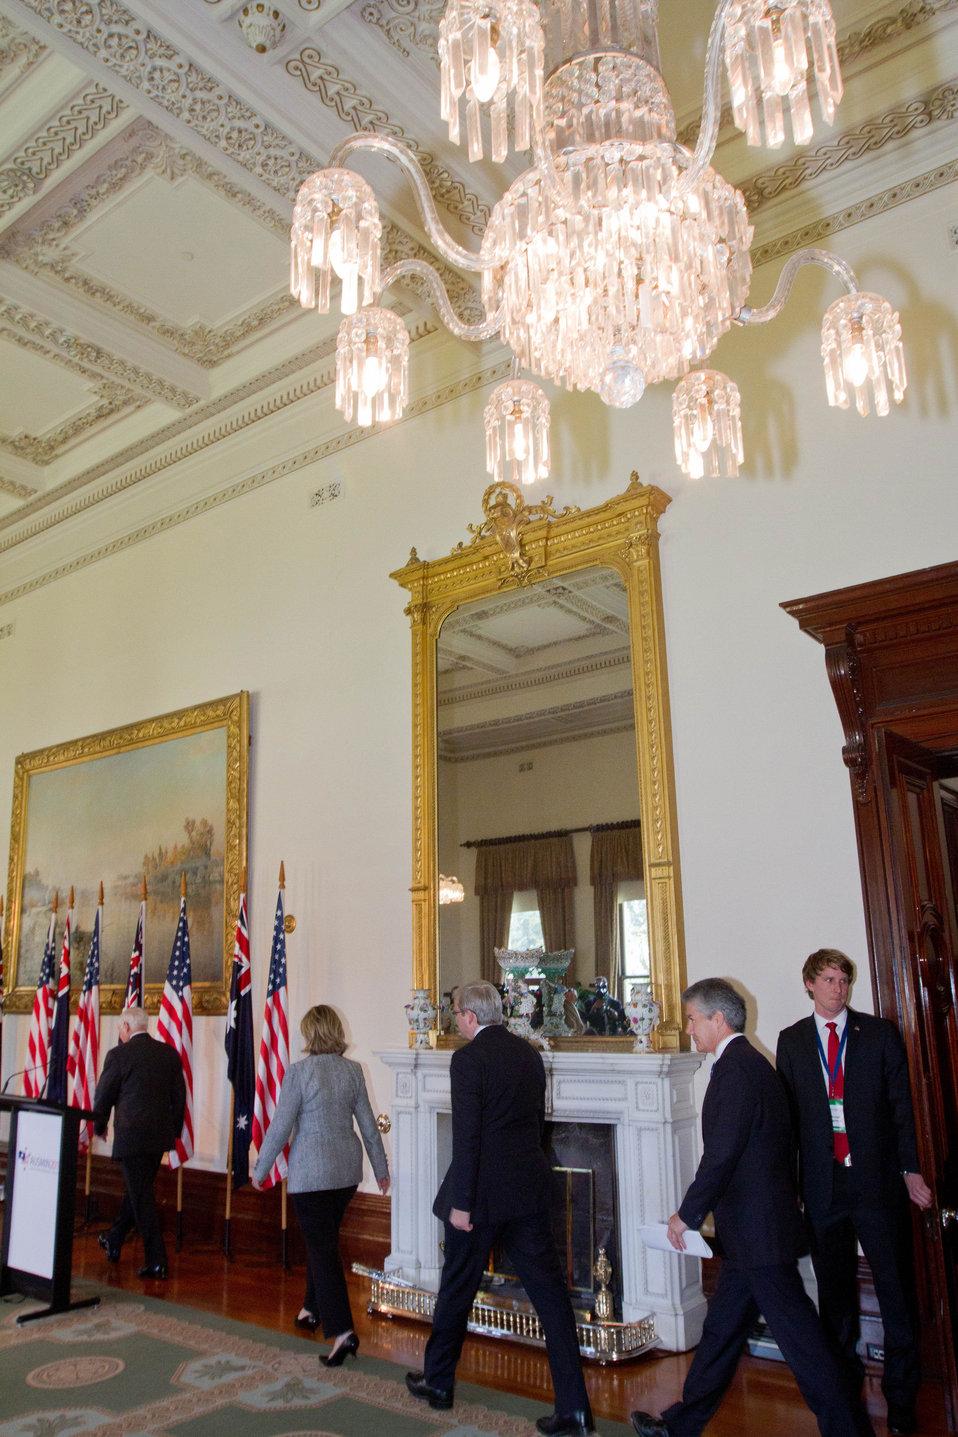 Secretary Gates, Secretary Clinton, Australian Foreign Affairs Minister Rudd, and Austrailan Defense Minister Smith Walk into the Press Conference